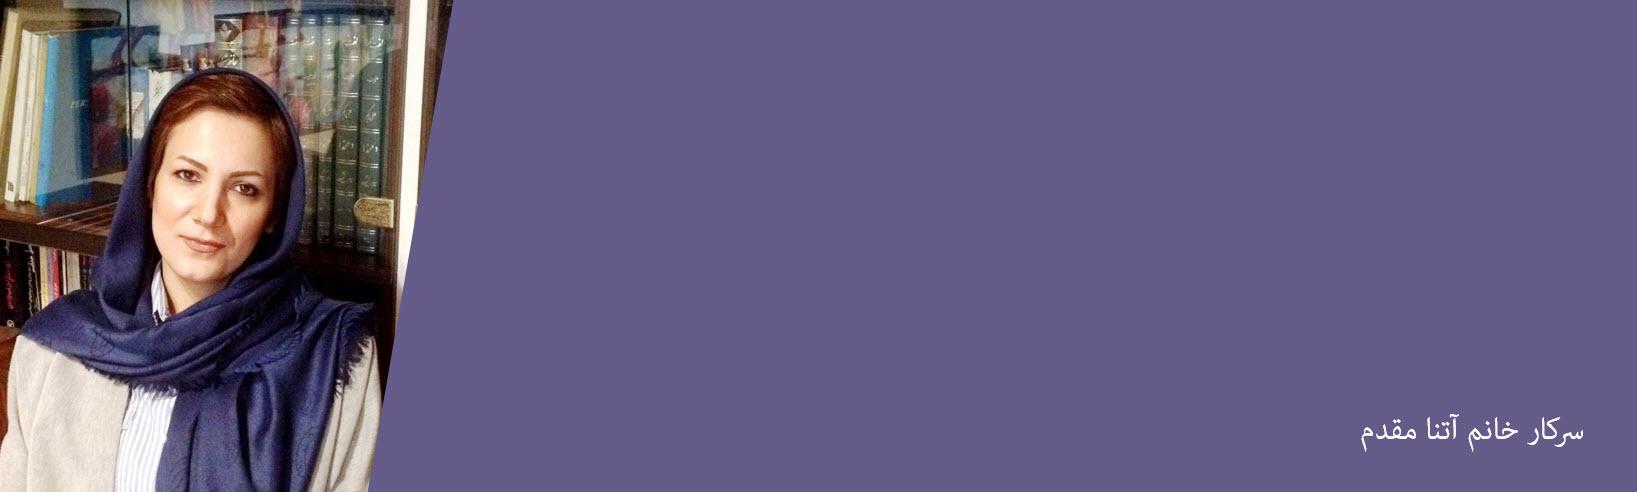 ۲۰۱۶-۰۲-۰۱_۲۲-۲۷-۴۵